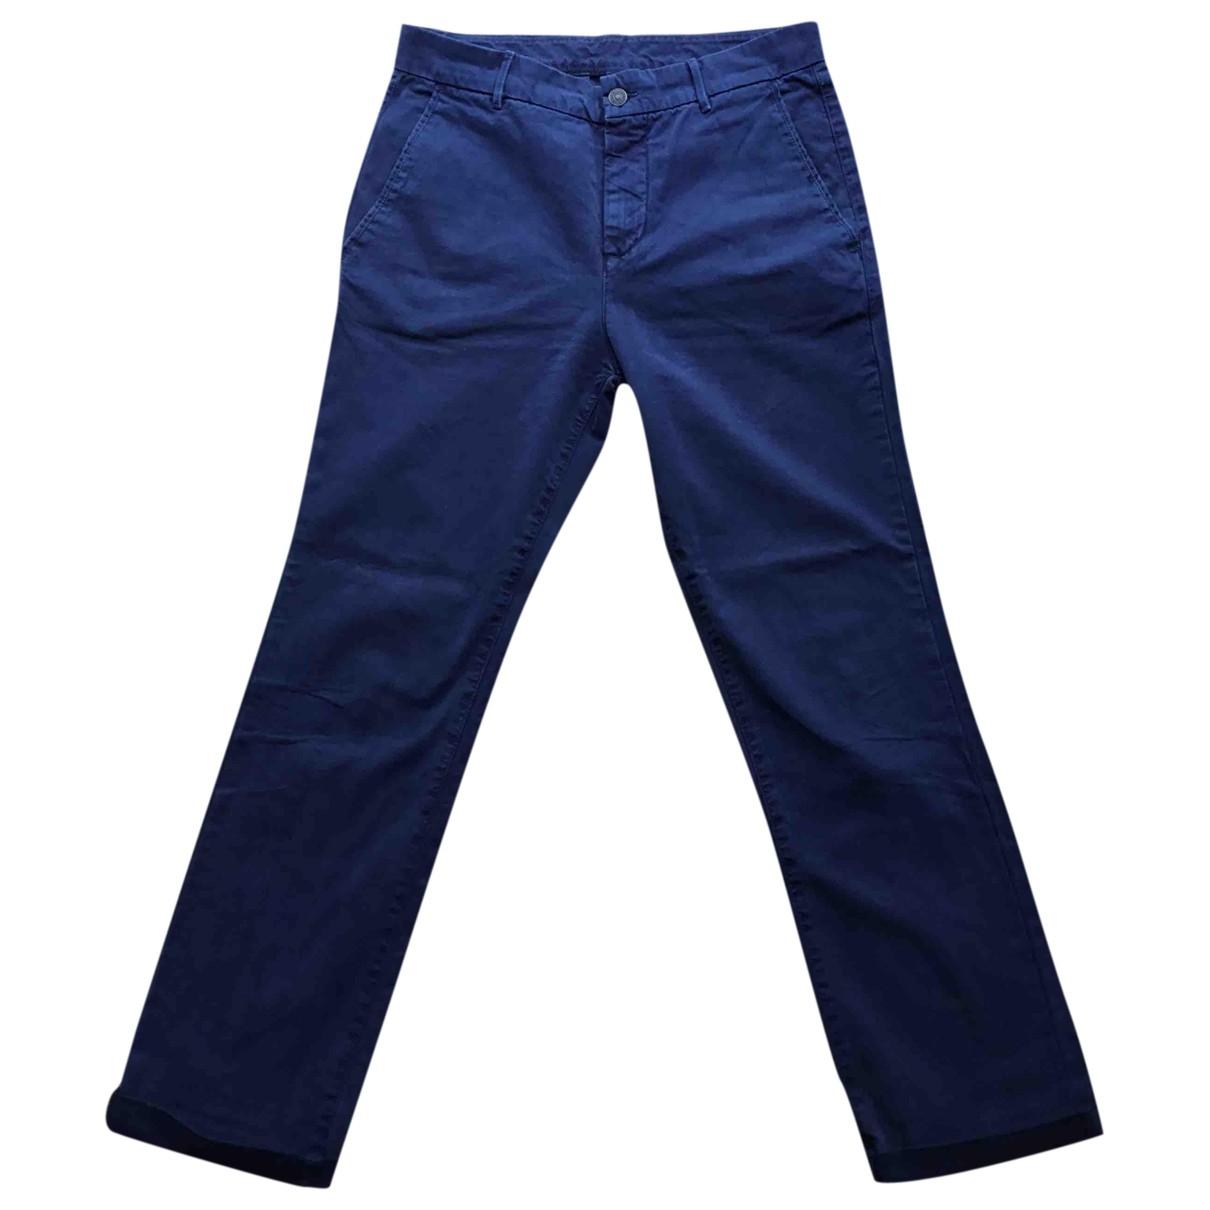 Pantalones en Algodon Azul 7 For All Mankind